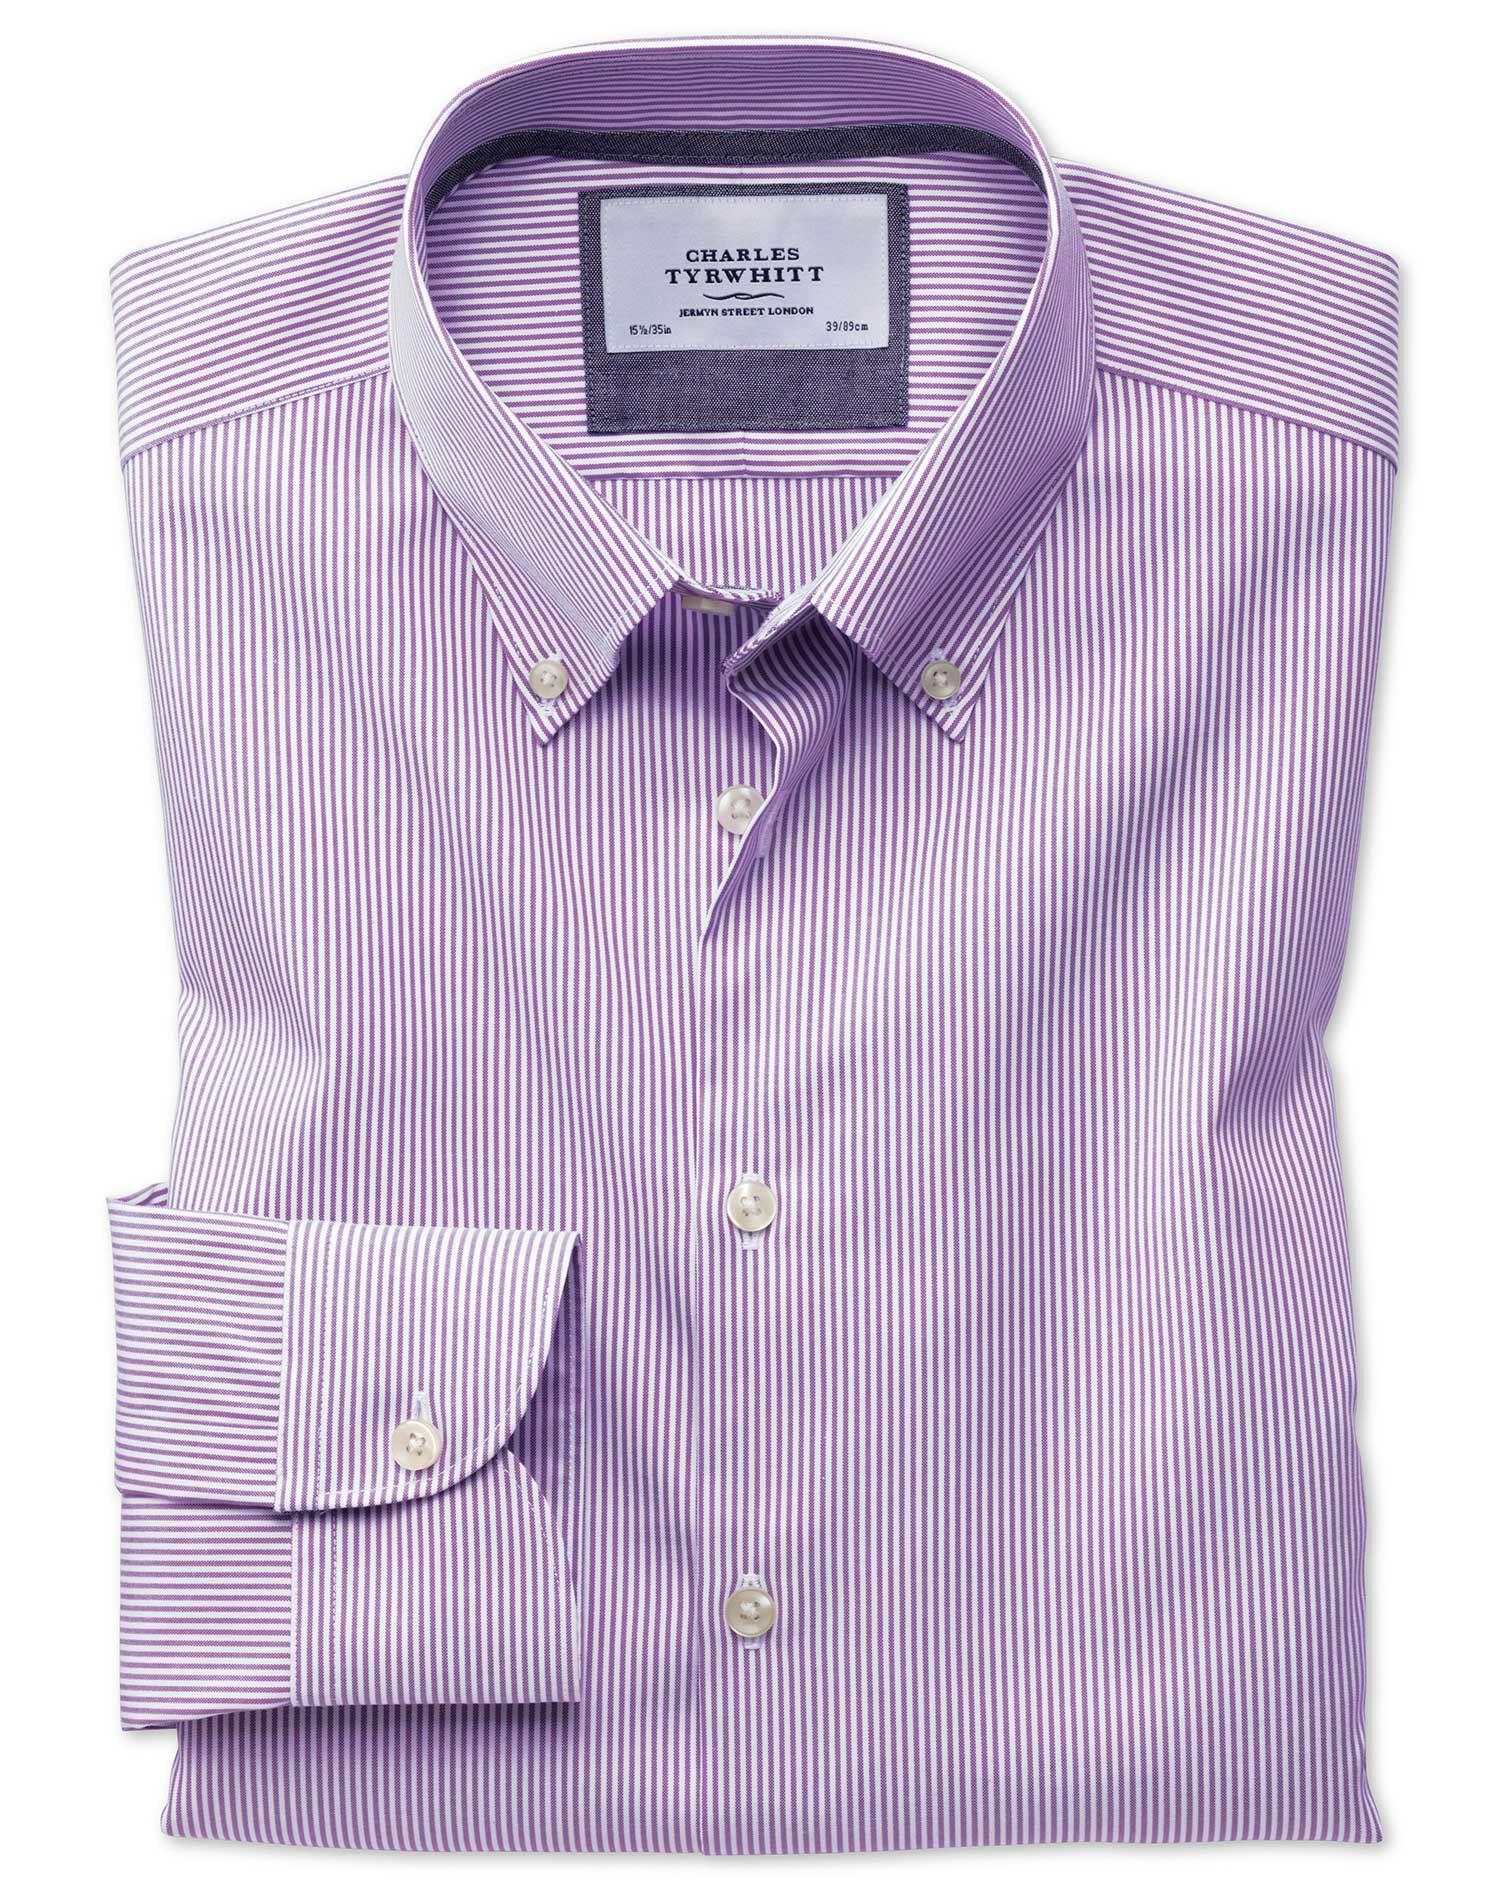 Slim Fit Button-Down Business Casual Non-Iron Violet Stripe Cotton Formal Shirt Single Cuff Size 17.